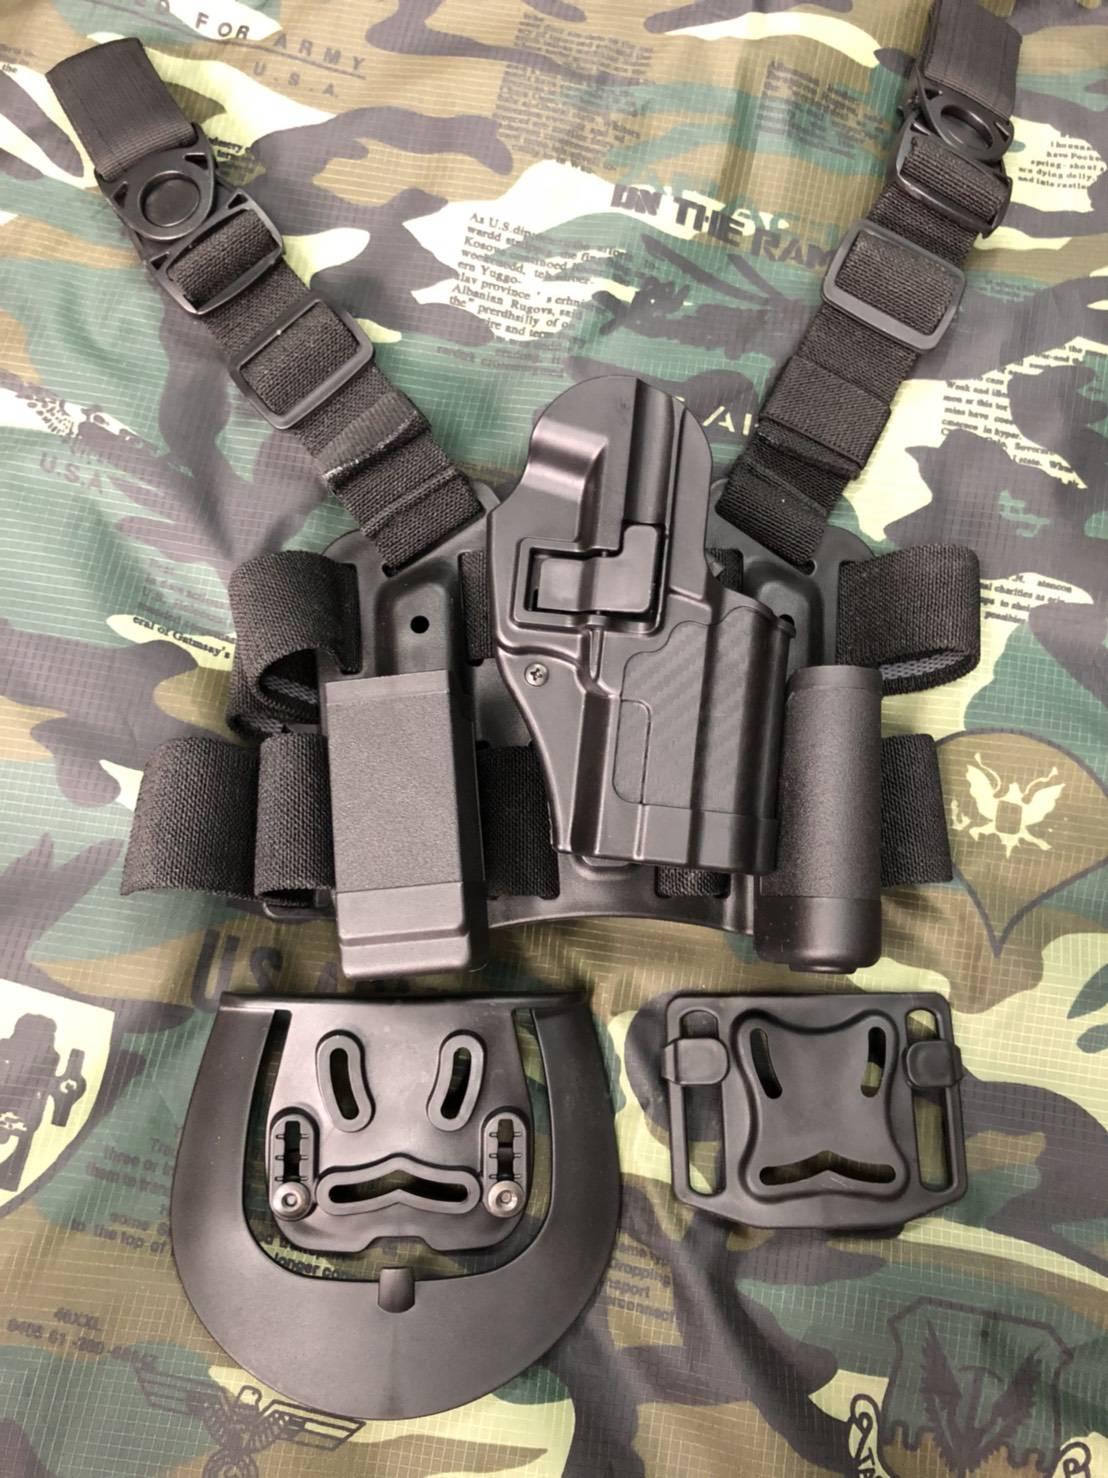 New.ชุดซองปืน SIG P320sp รัดต้นขา ราคาพิเศษ